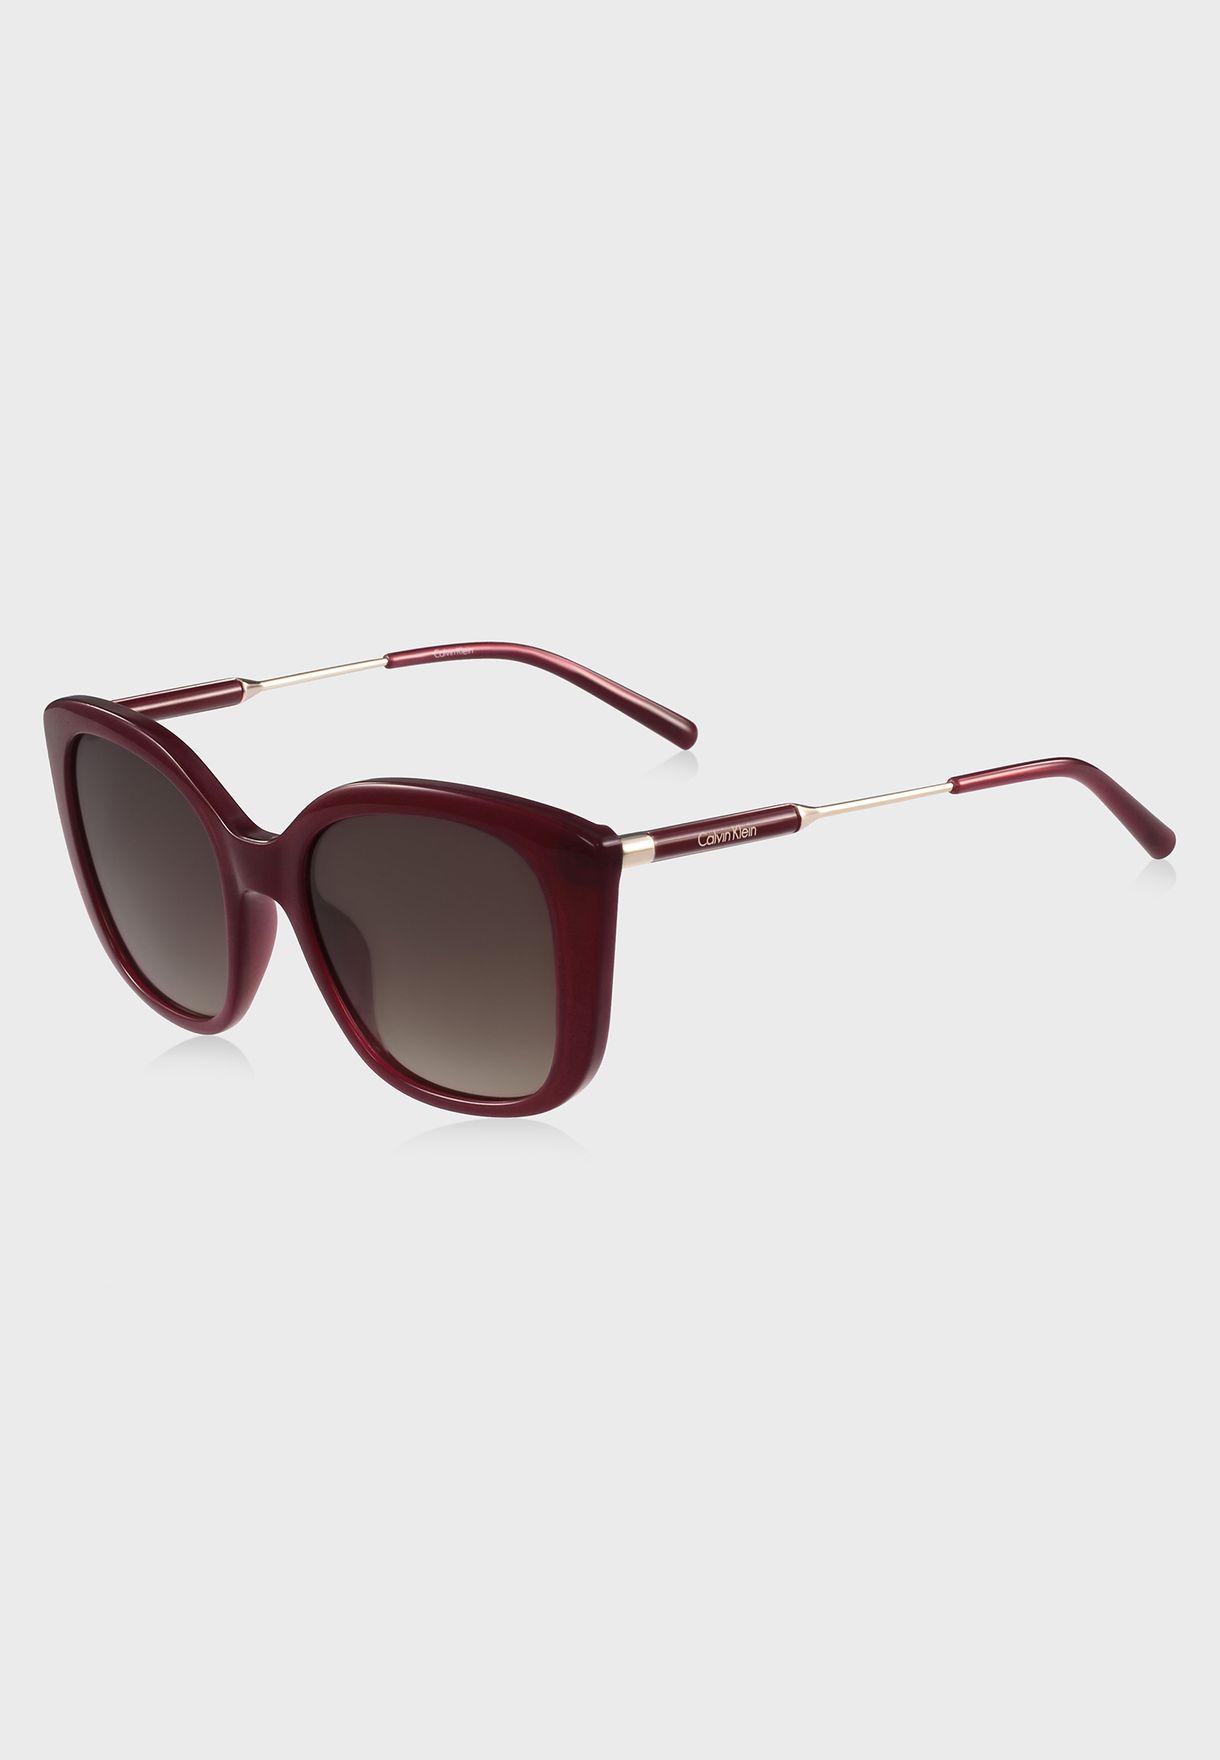 CK3200S Square Sunglasses